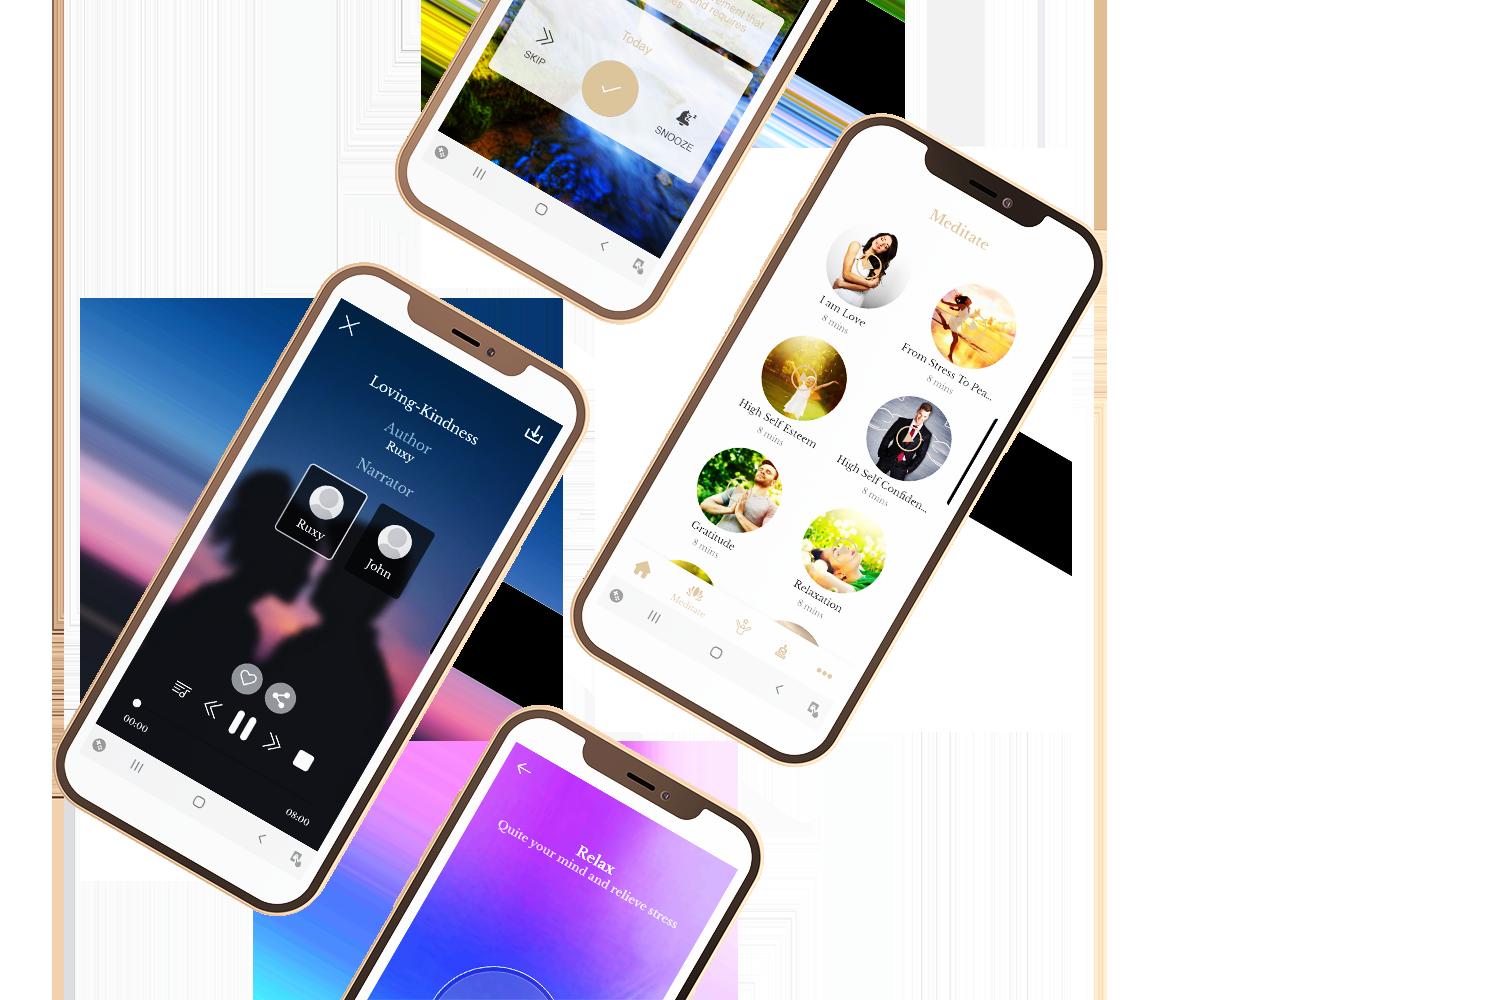 template phone 1-b